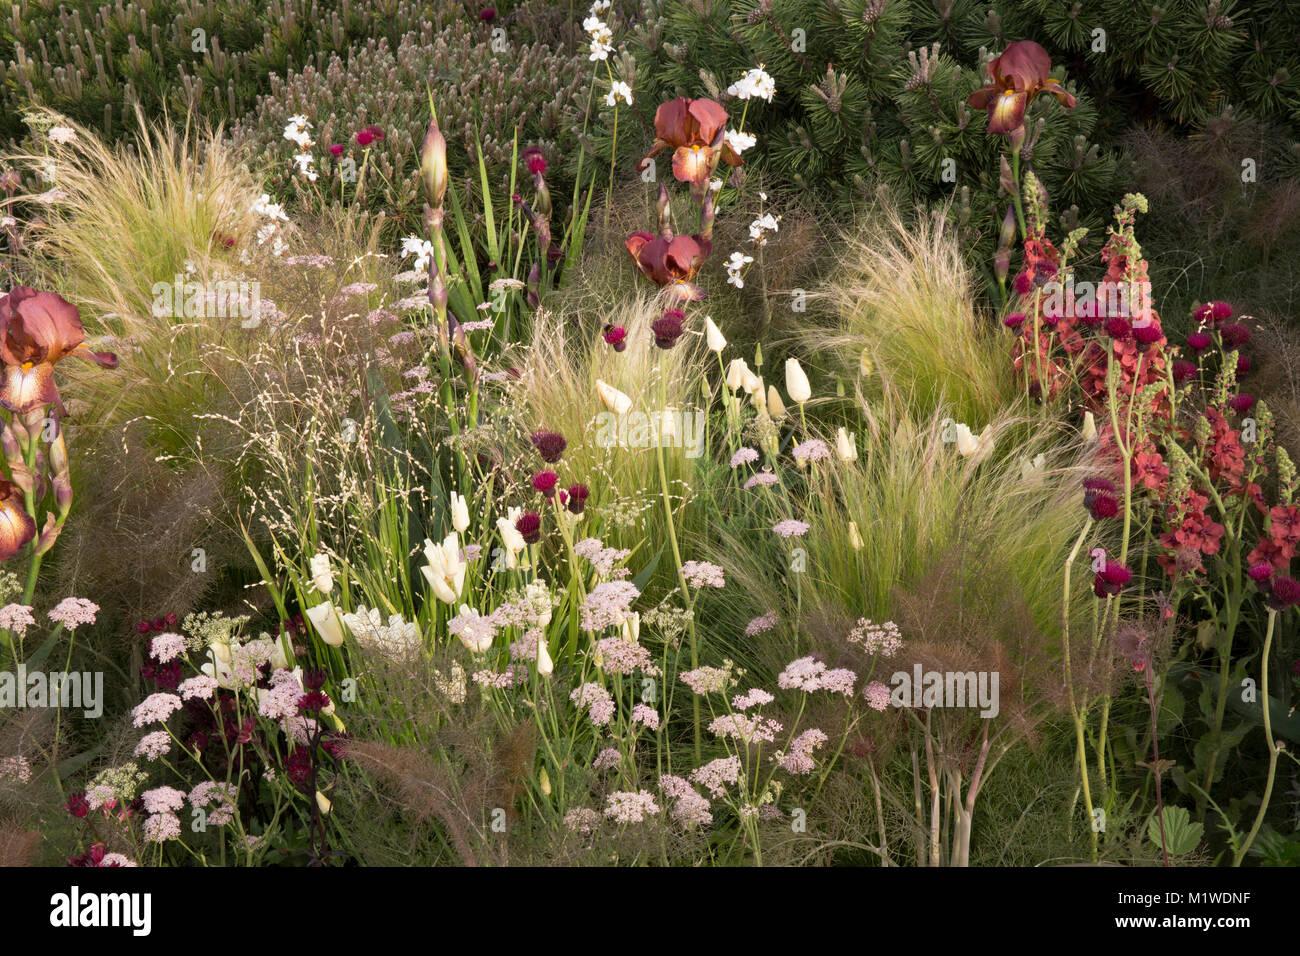 The BBC Radio 2 Jeremy Vine Texture Garden, Iris germanica 'Kent Pride', Cirsium rivulare 'Atropurpureum', - Stock Image